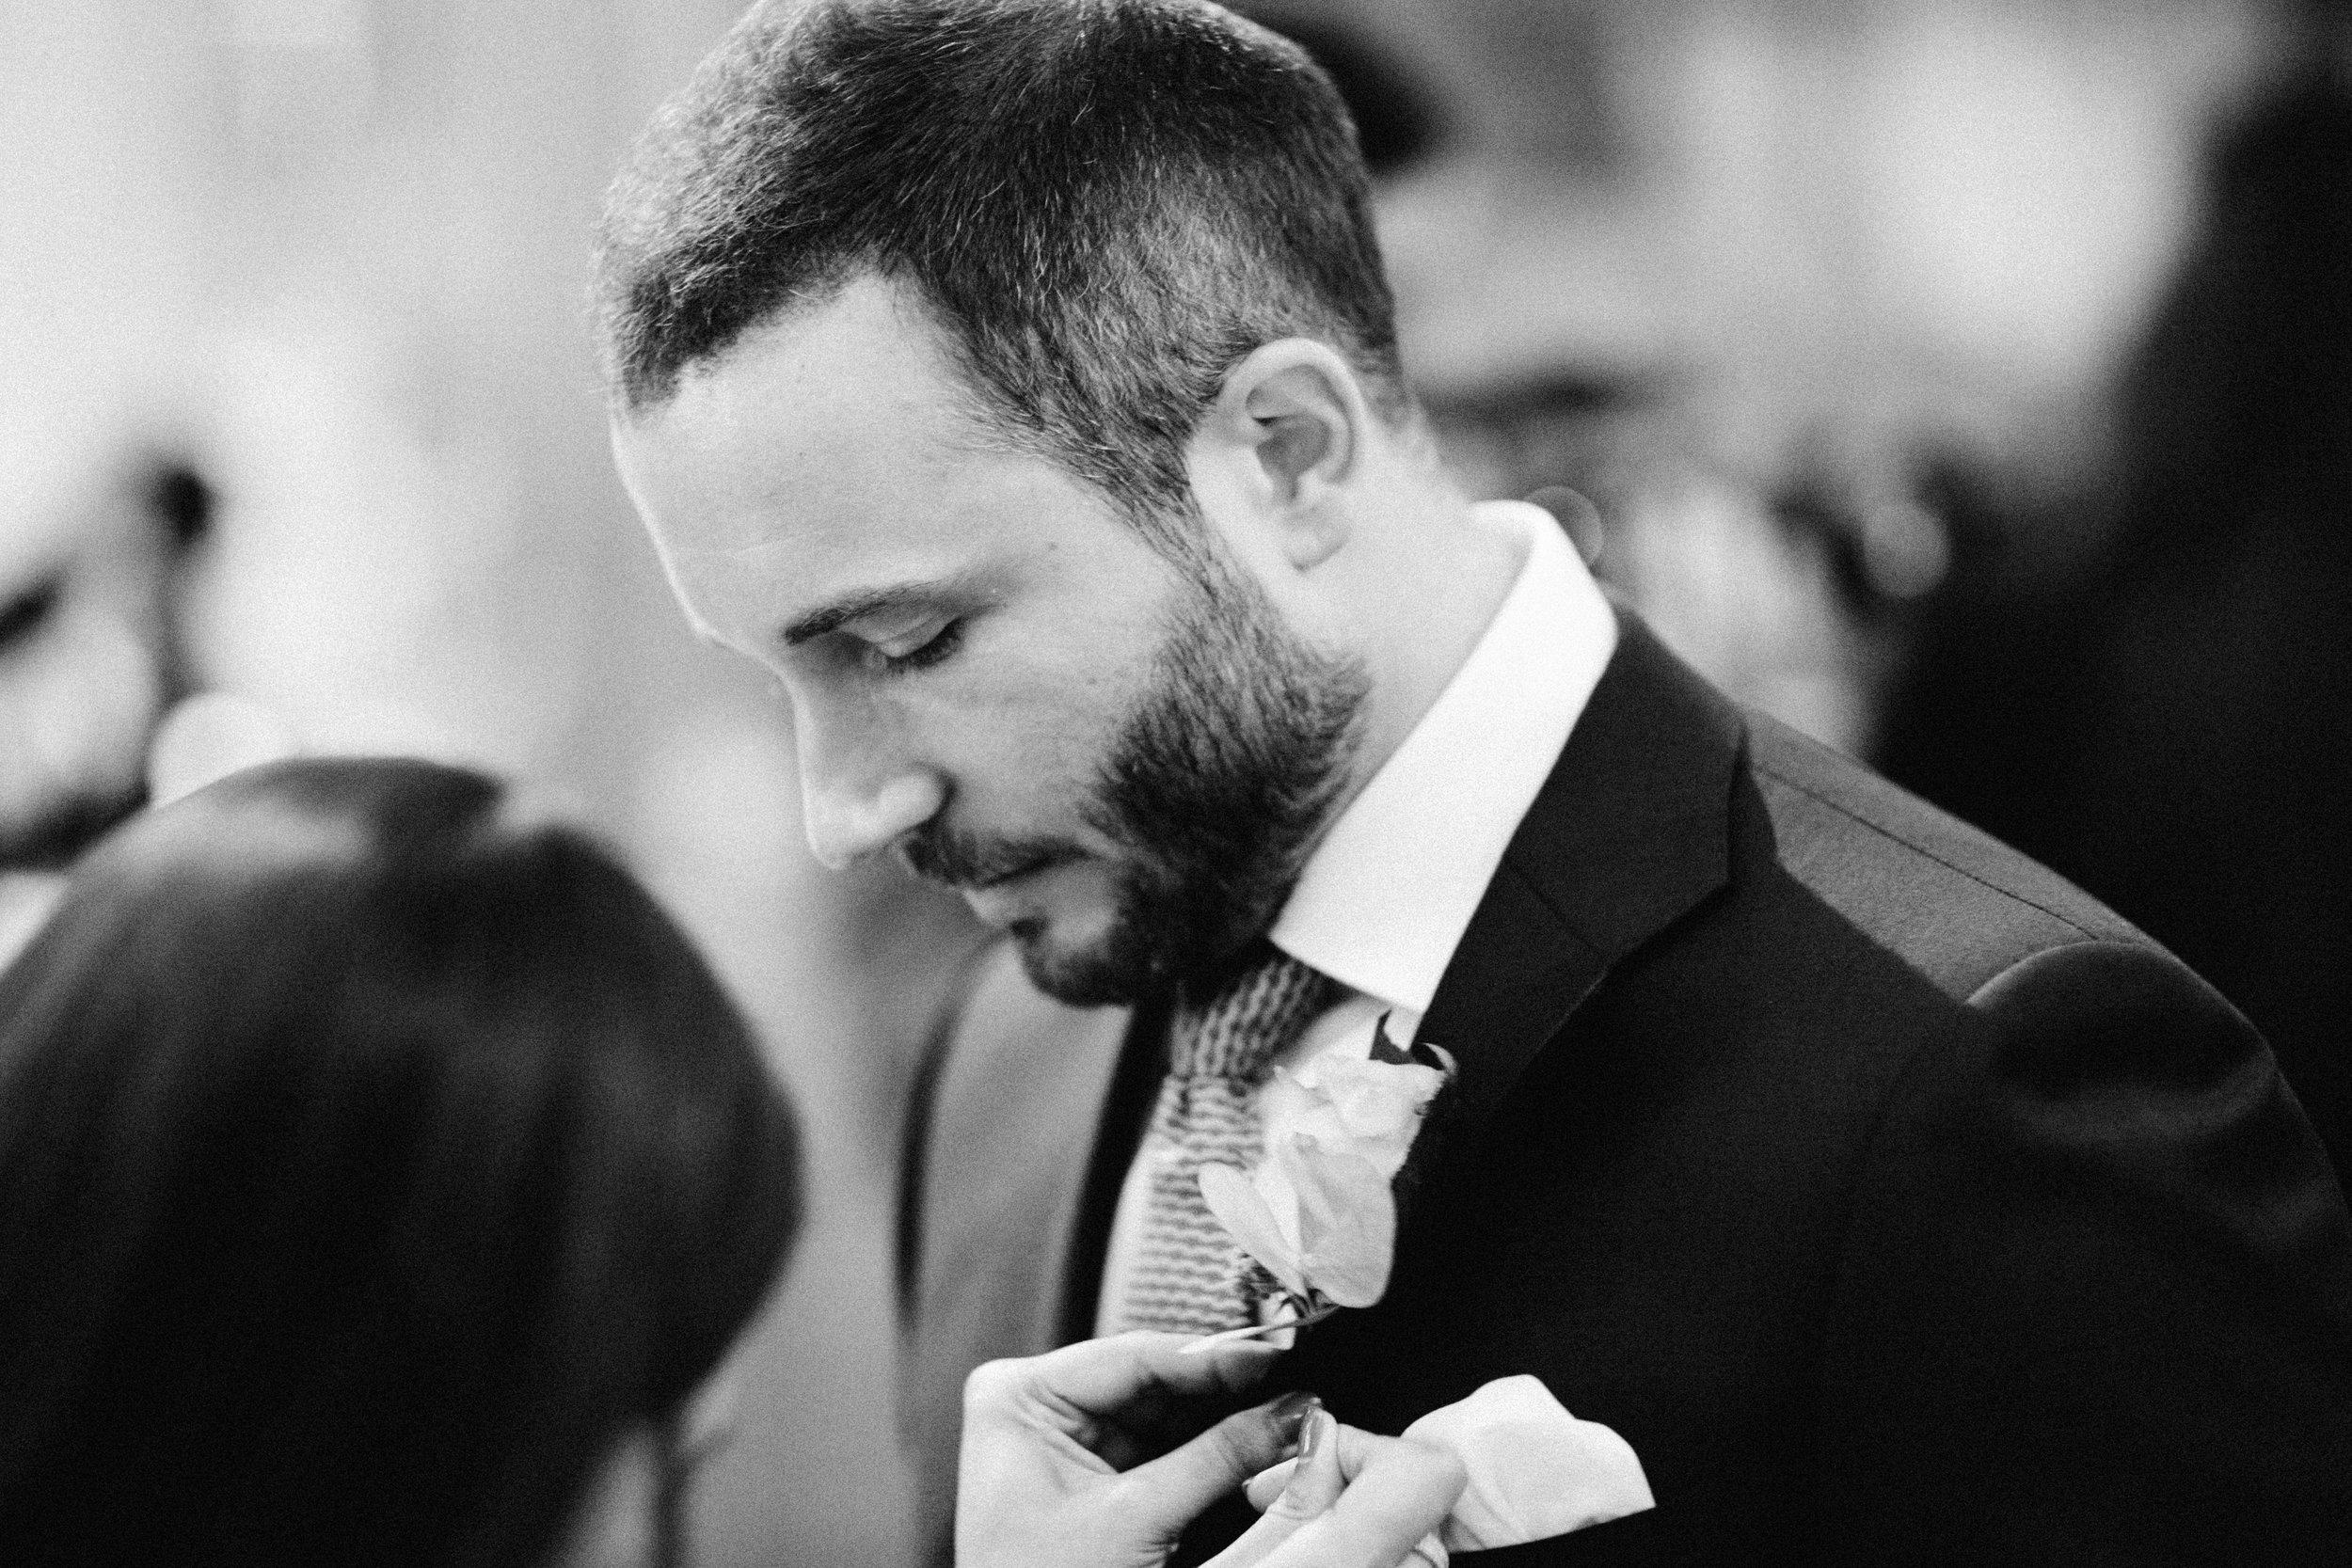 alternative asian Mehndi and wedding in Tatton Park - Michael Newington Gray-98.jpg